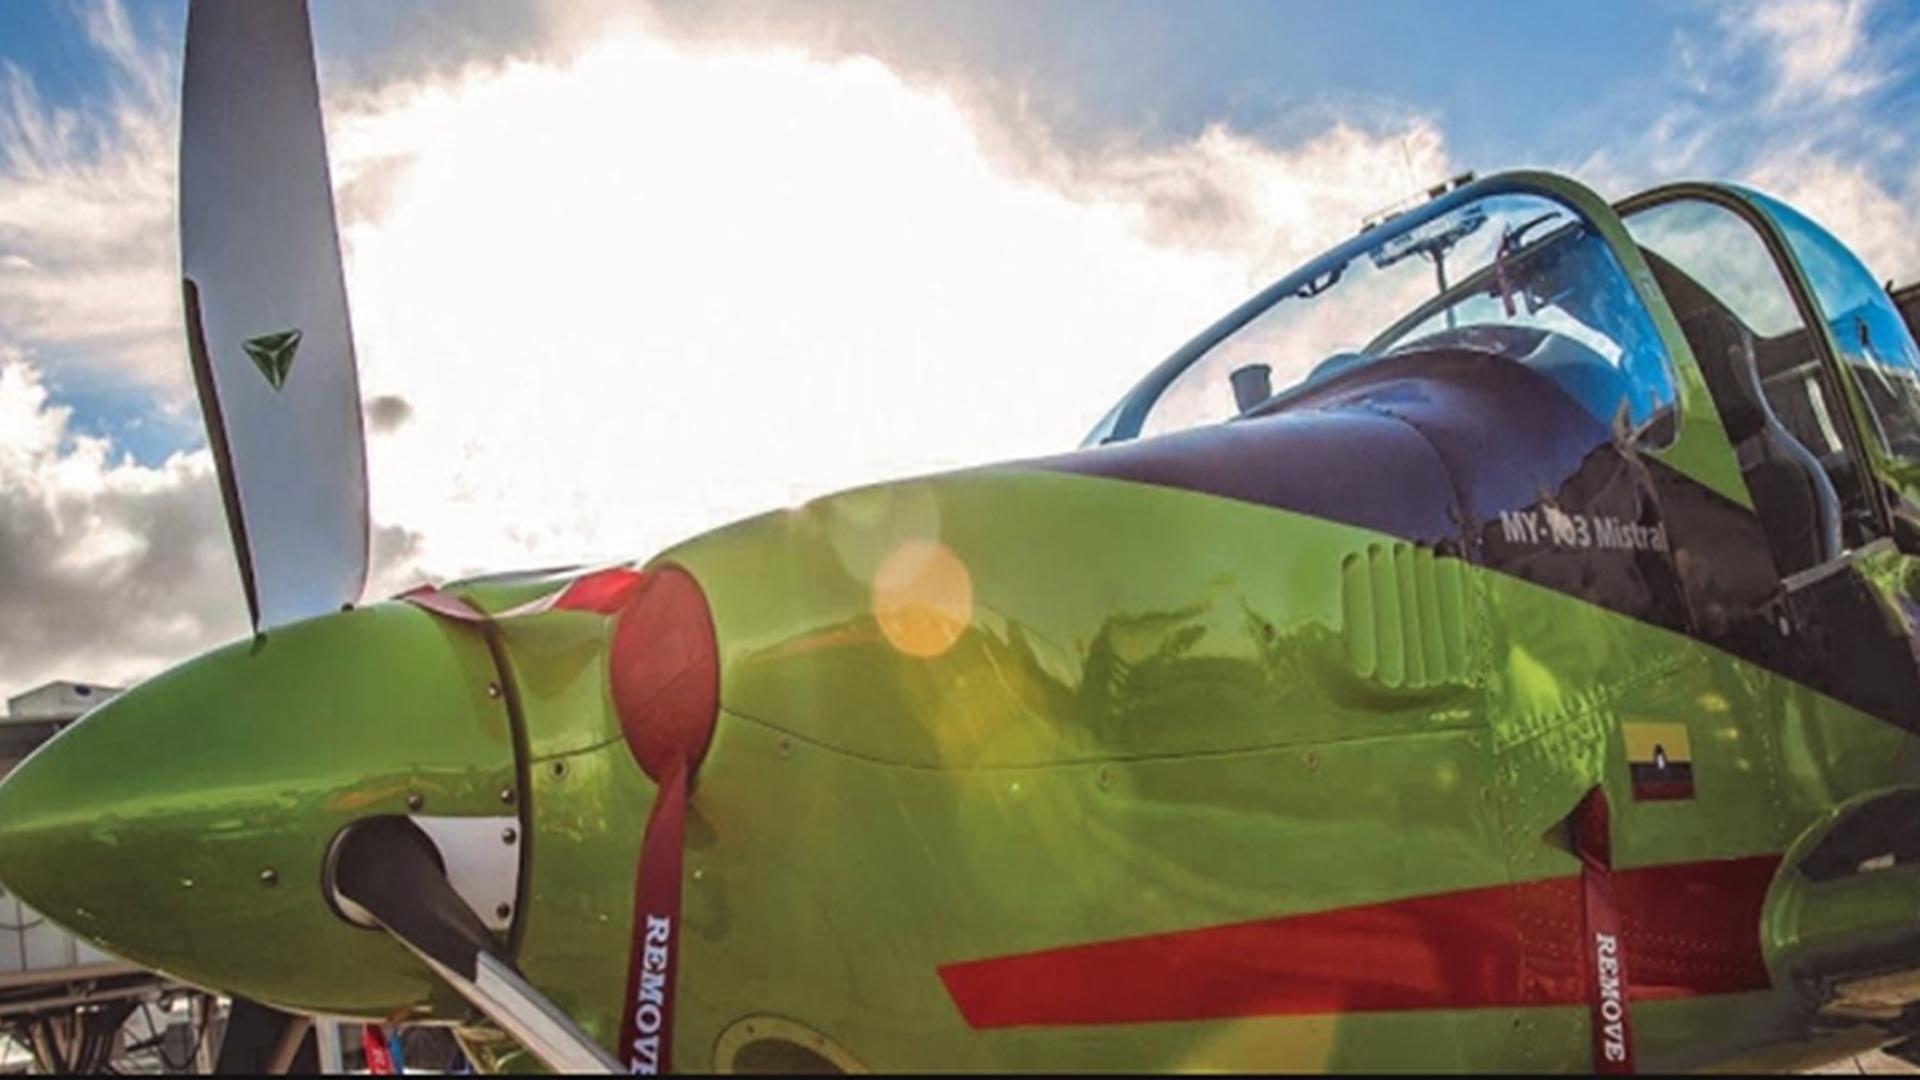 AerospaceWebinar_tcm27-57997.jpg